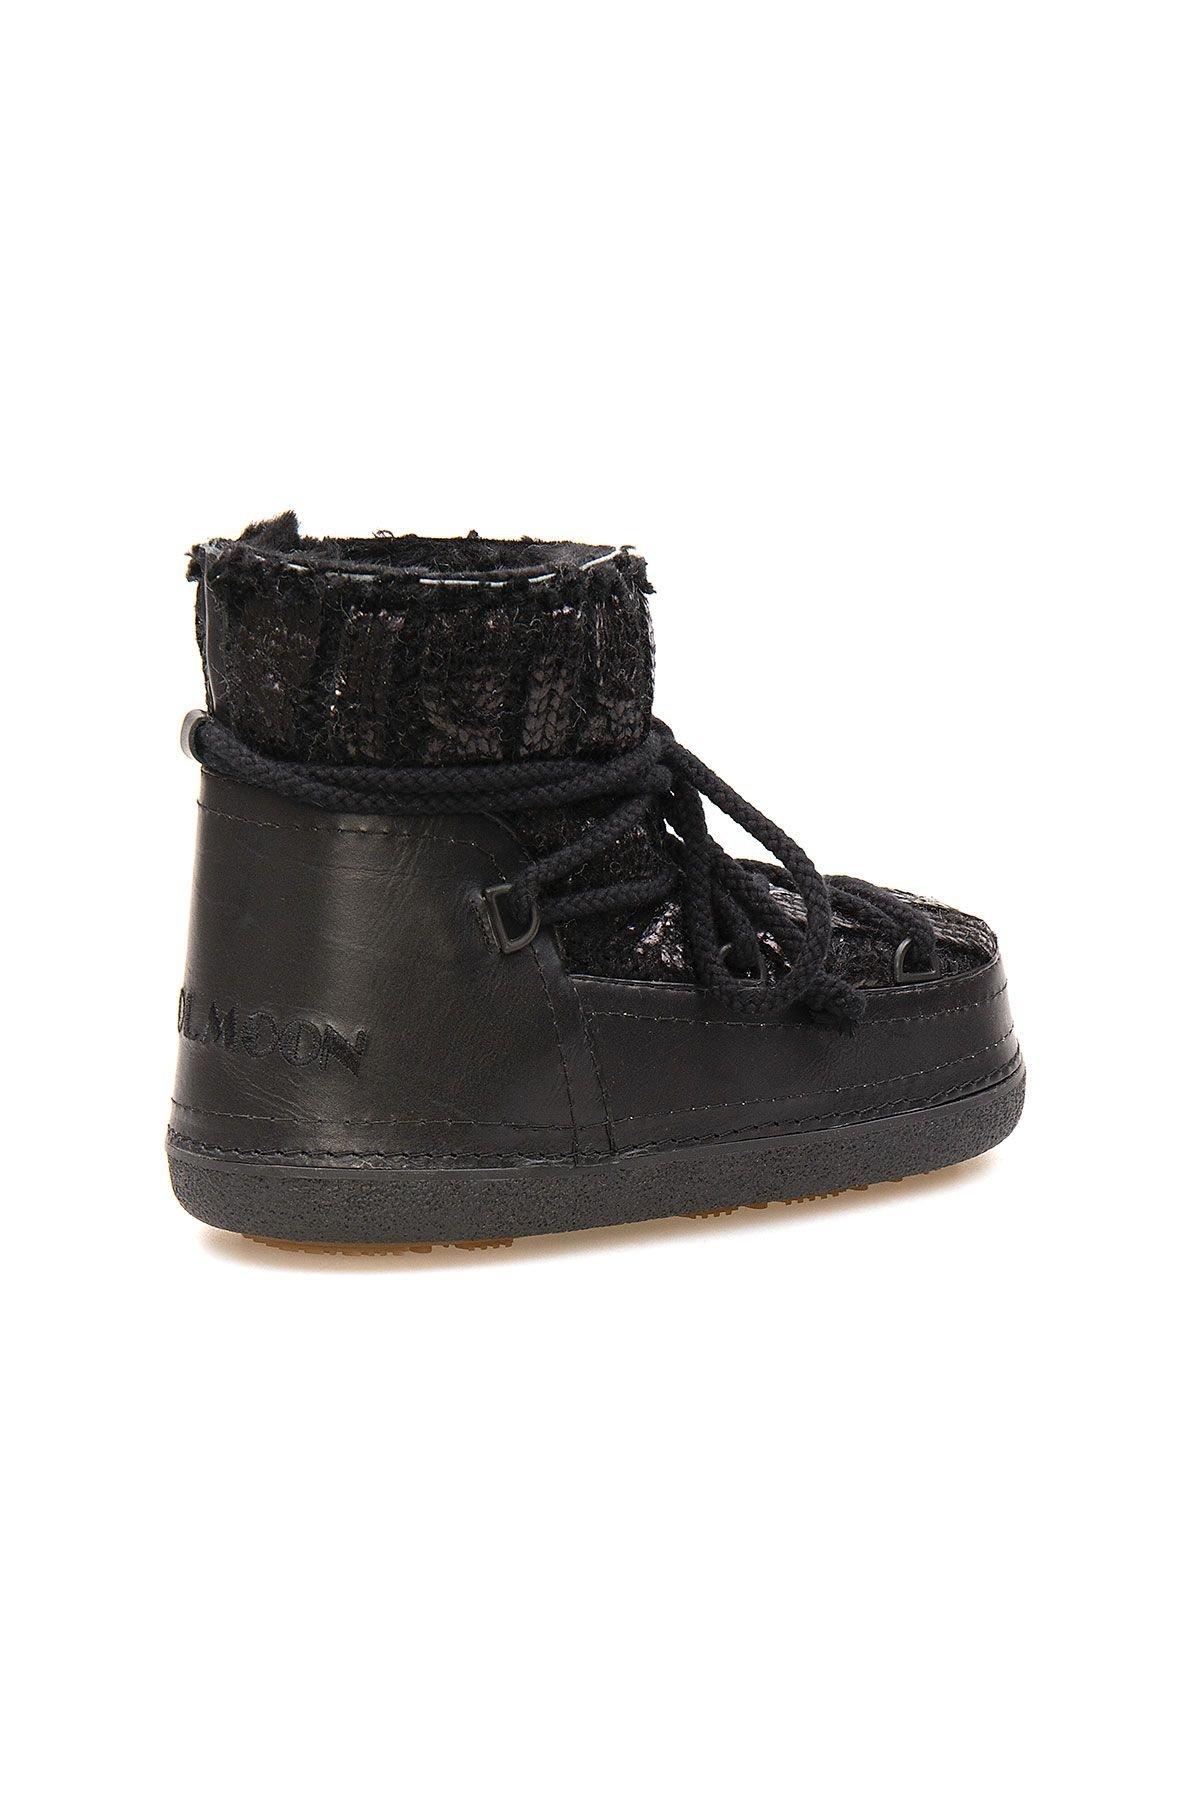 Cool Moon Genuine Sheepskin Lined Women's Snow Boots 251320 Black